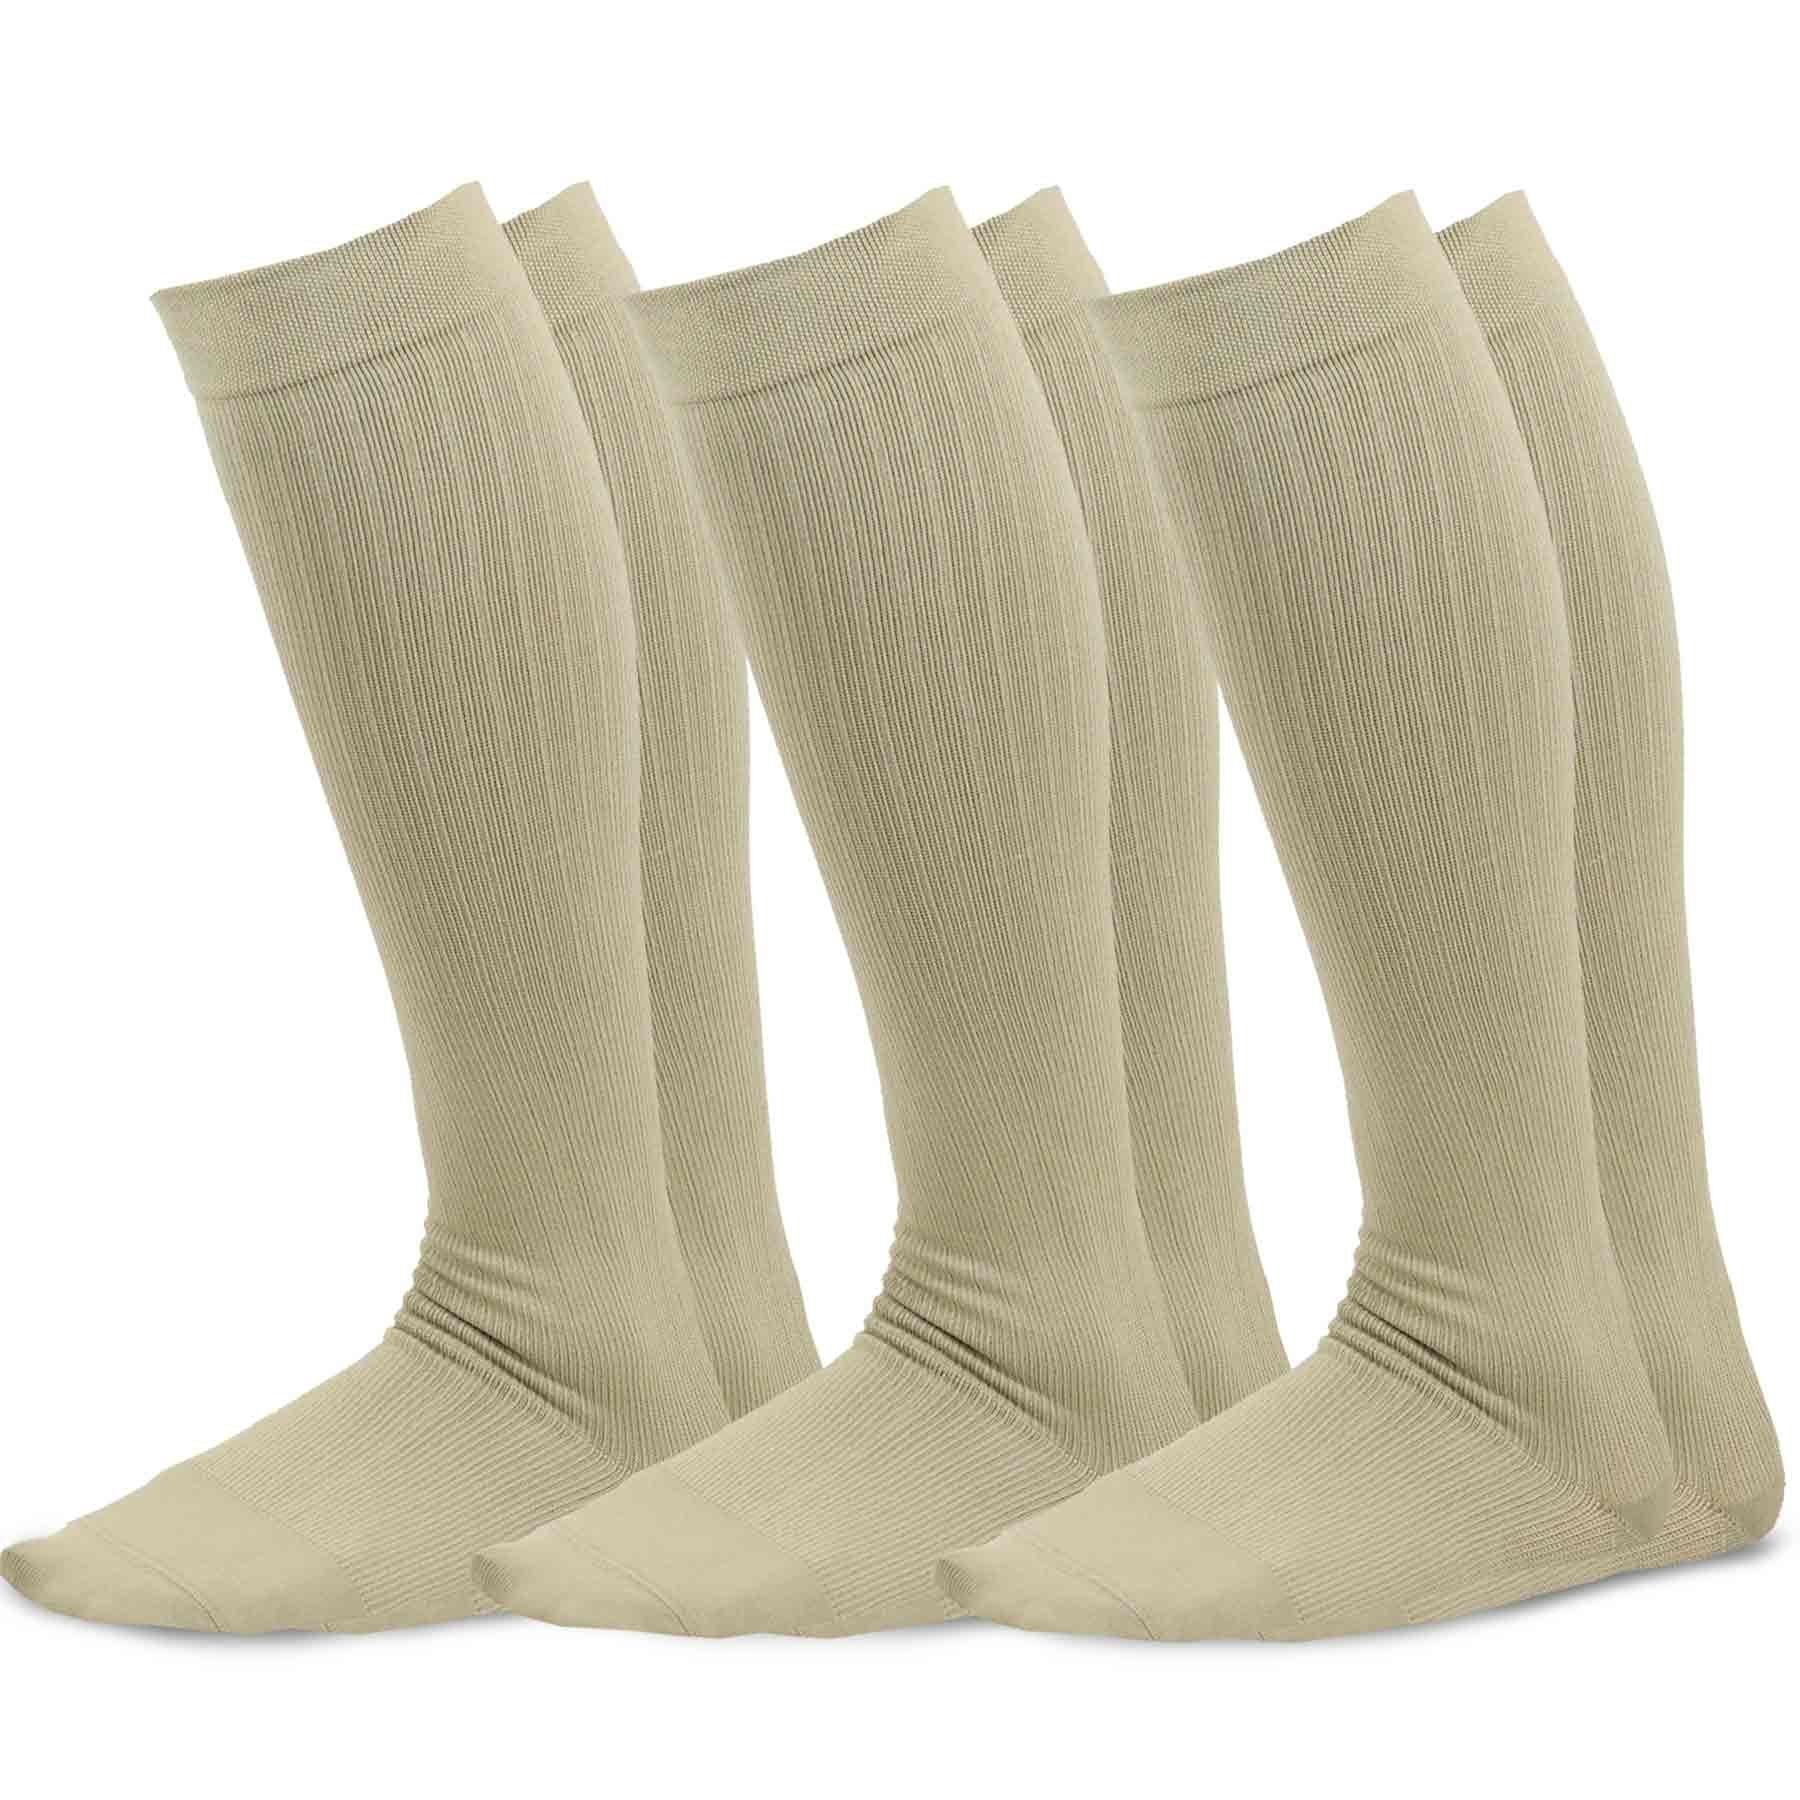 TeeHee Microfiber Compression Knee High Socks with Rib 3-Pack (Small (8-9), Beige)